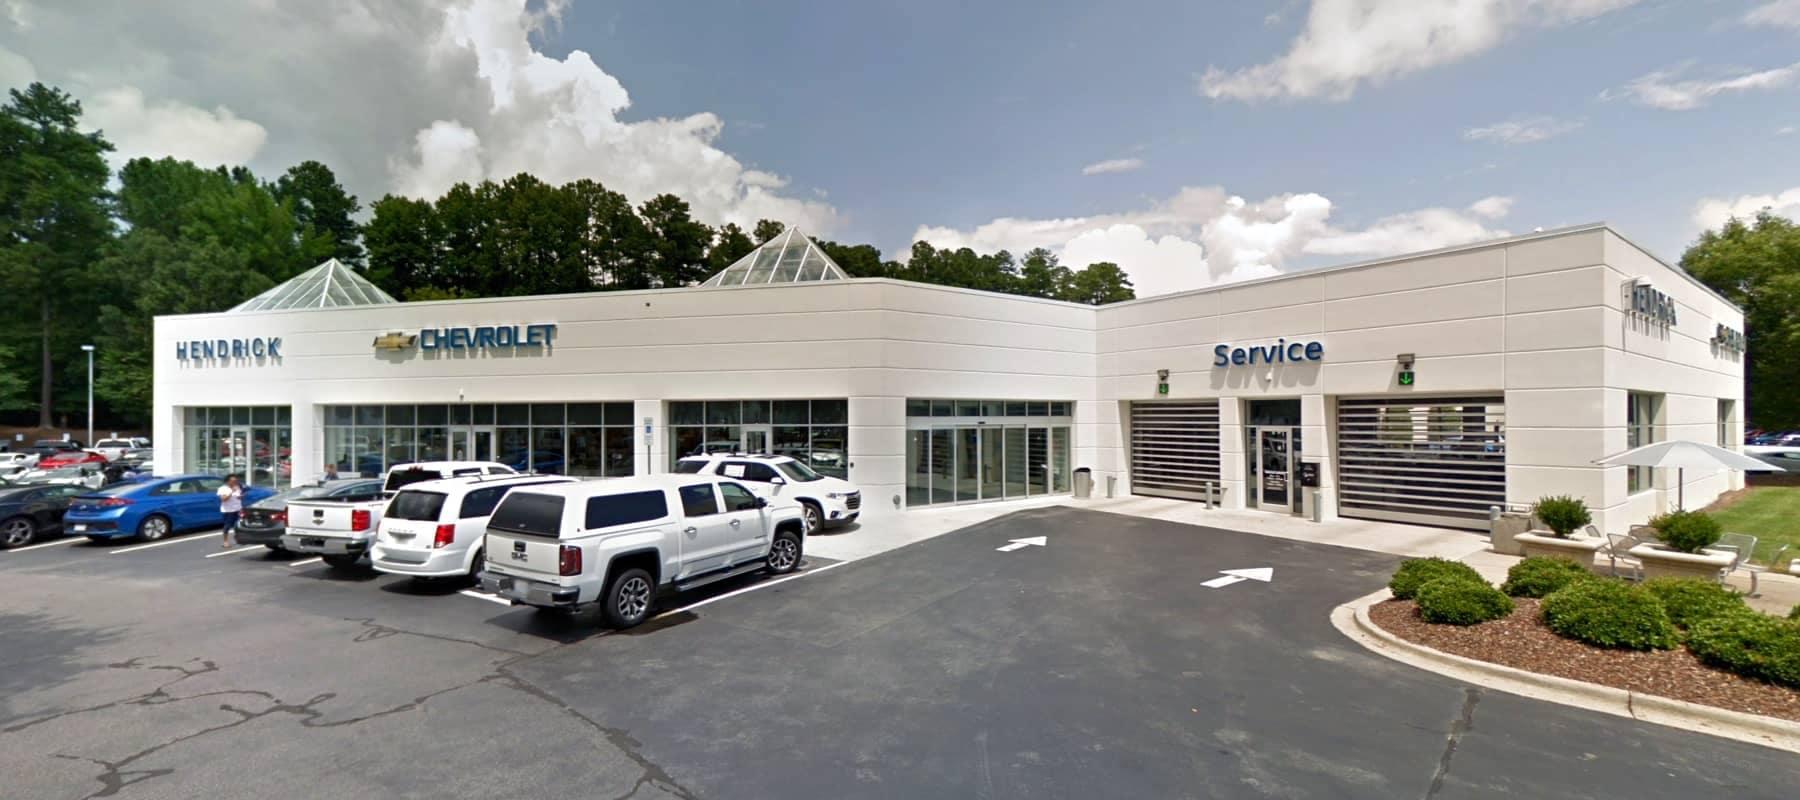 An exterior shot of Hendrick Chevrolet Cary